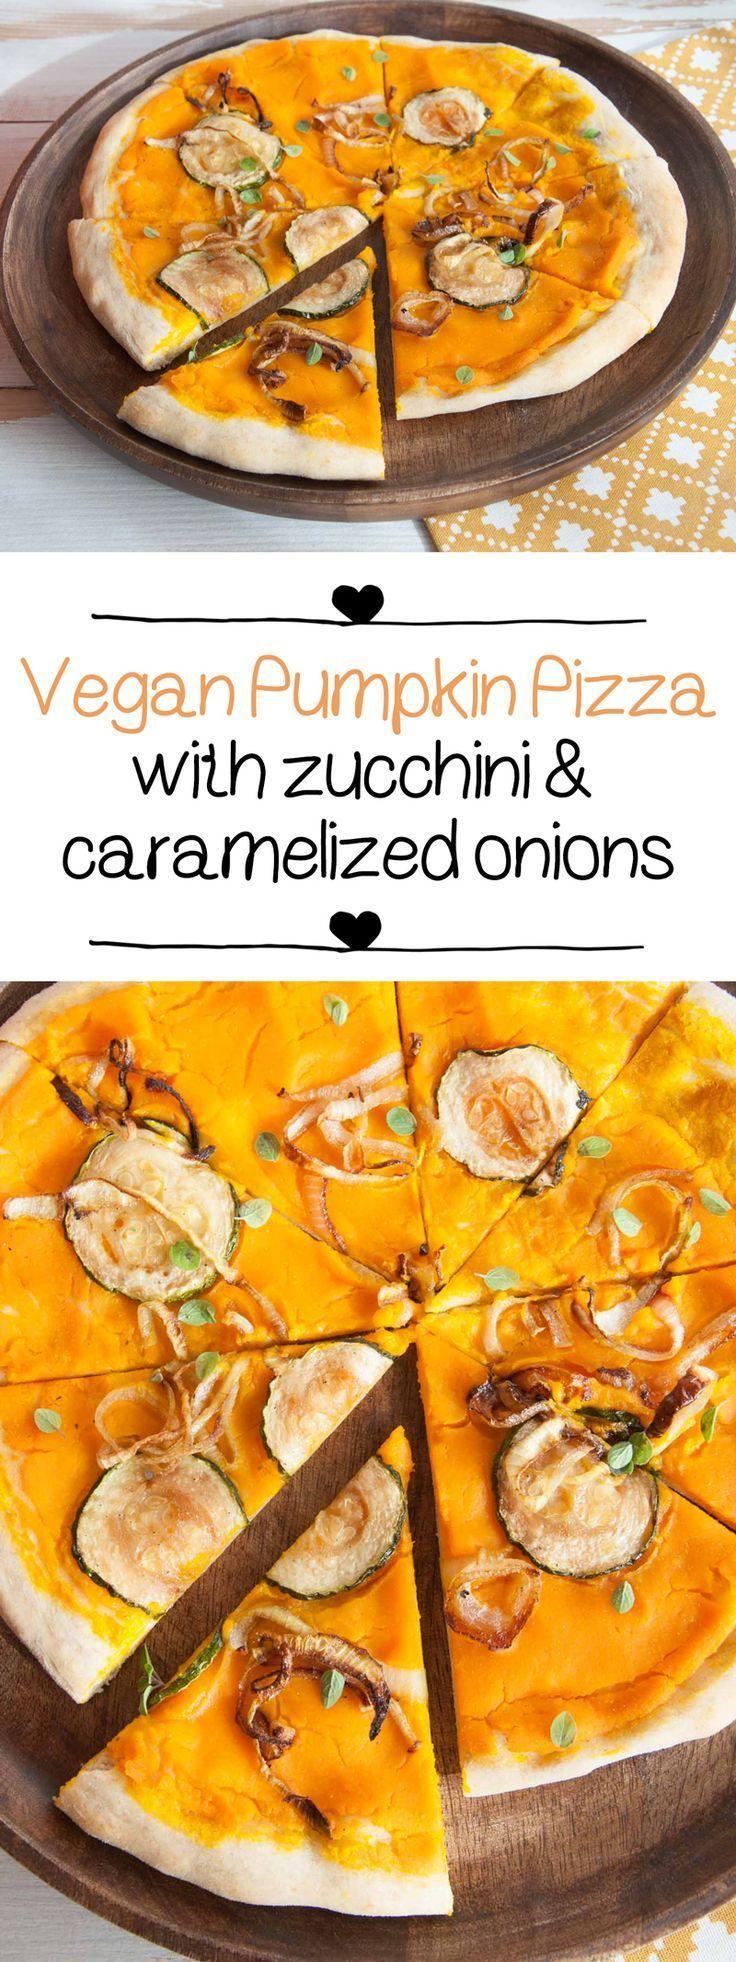 Vegan Pumpkin Pizza with zucchini and caramelized onions | http://ElephantasticVegan.com